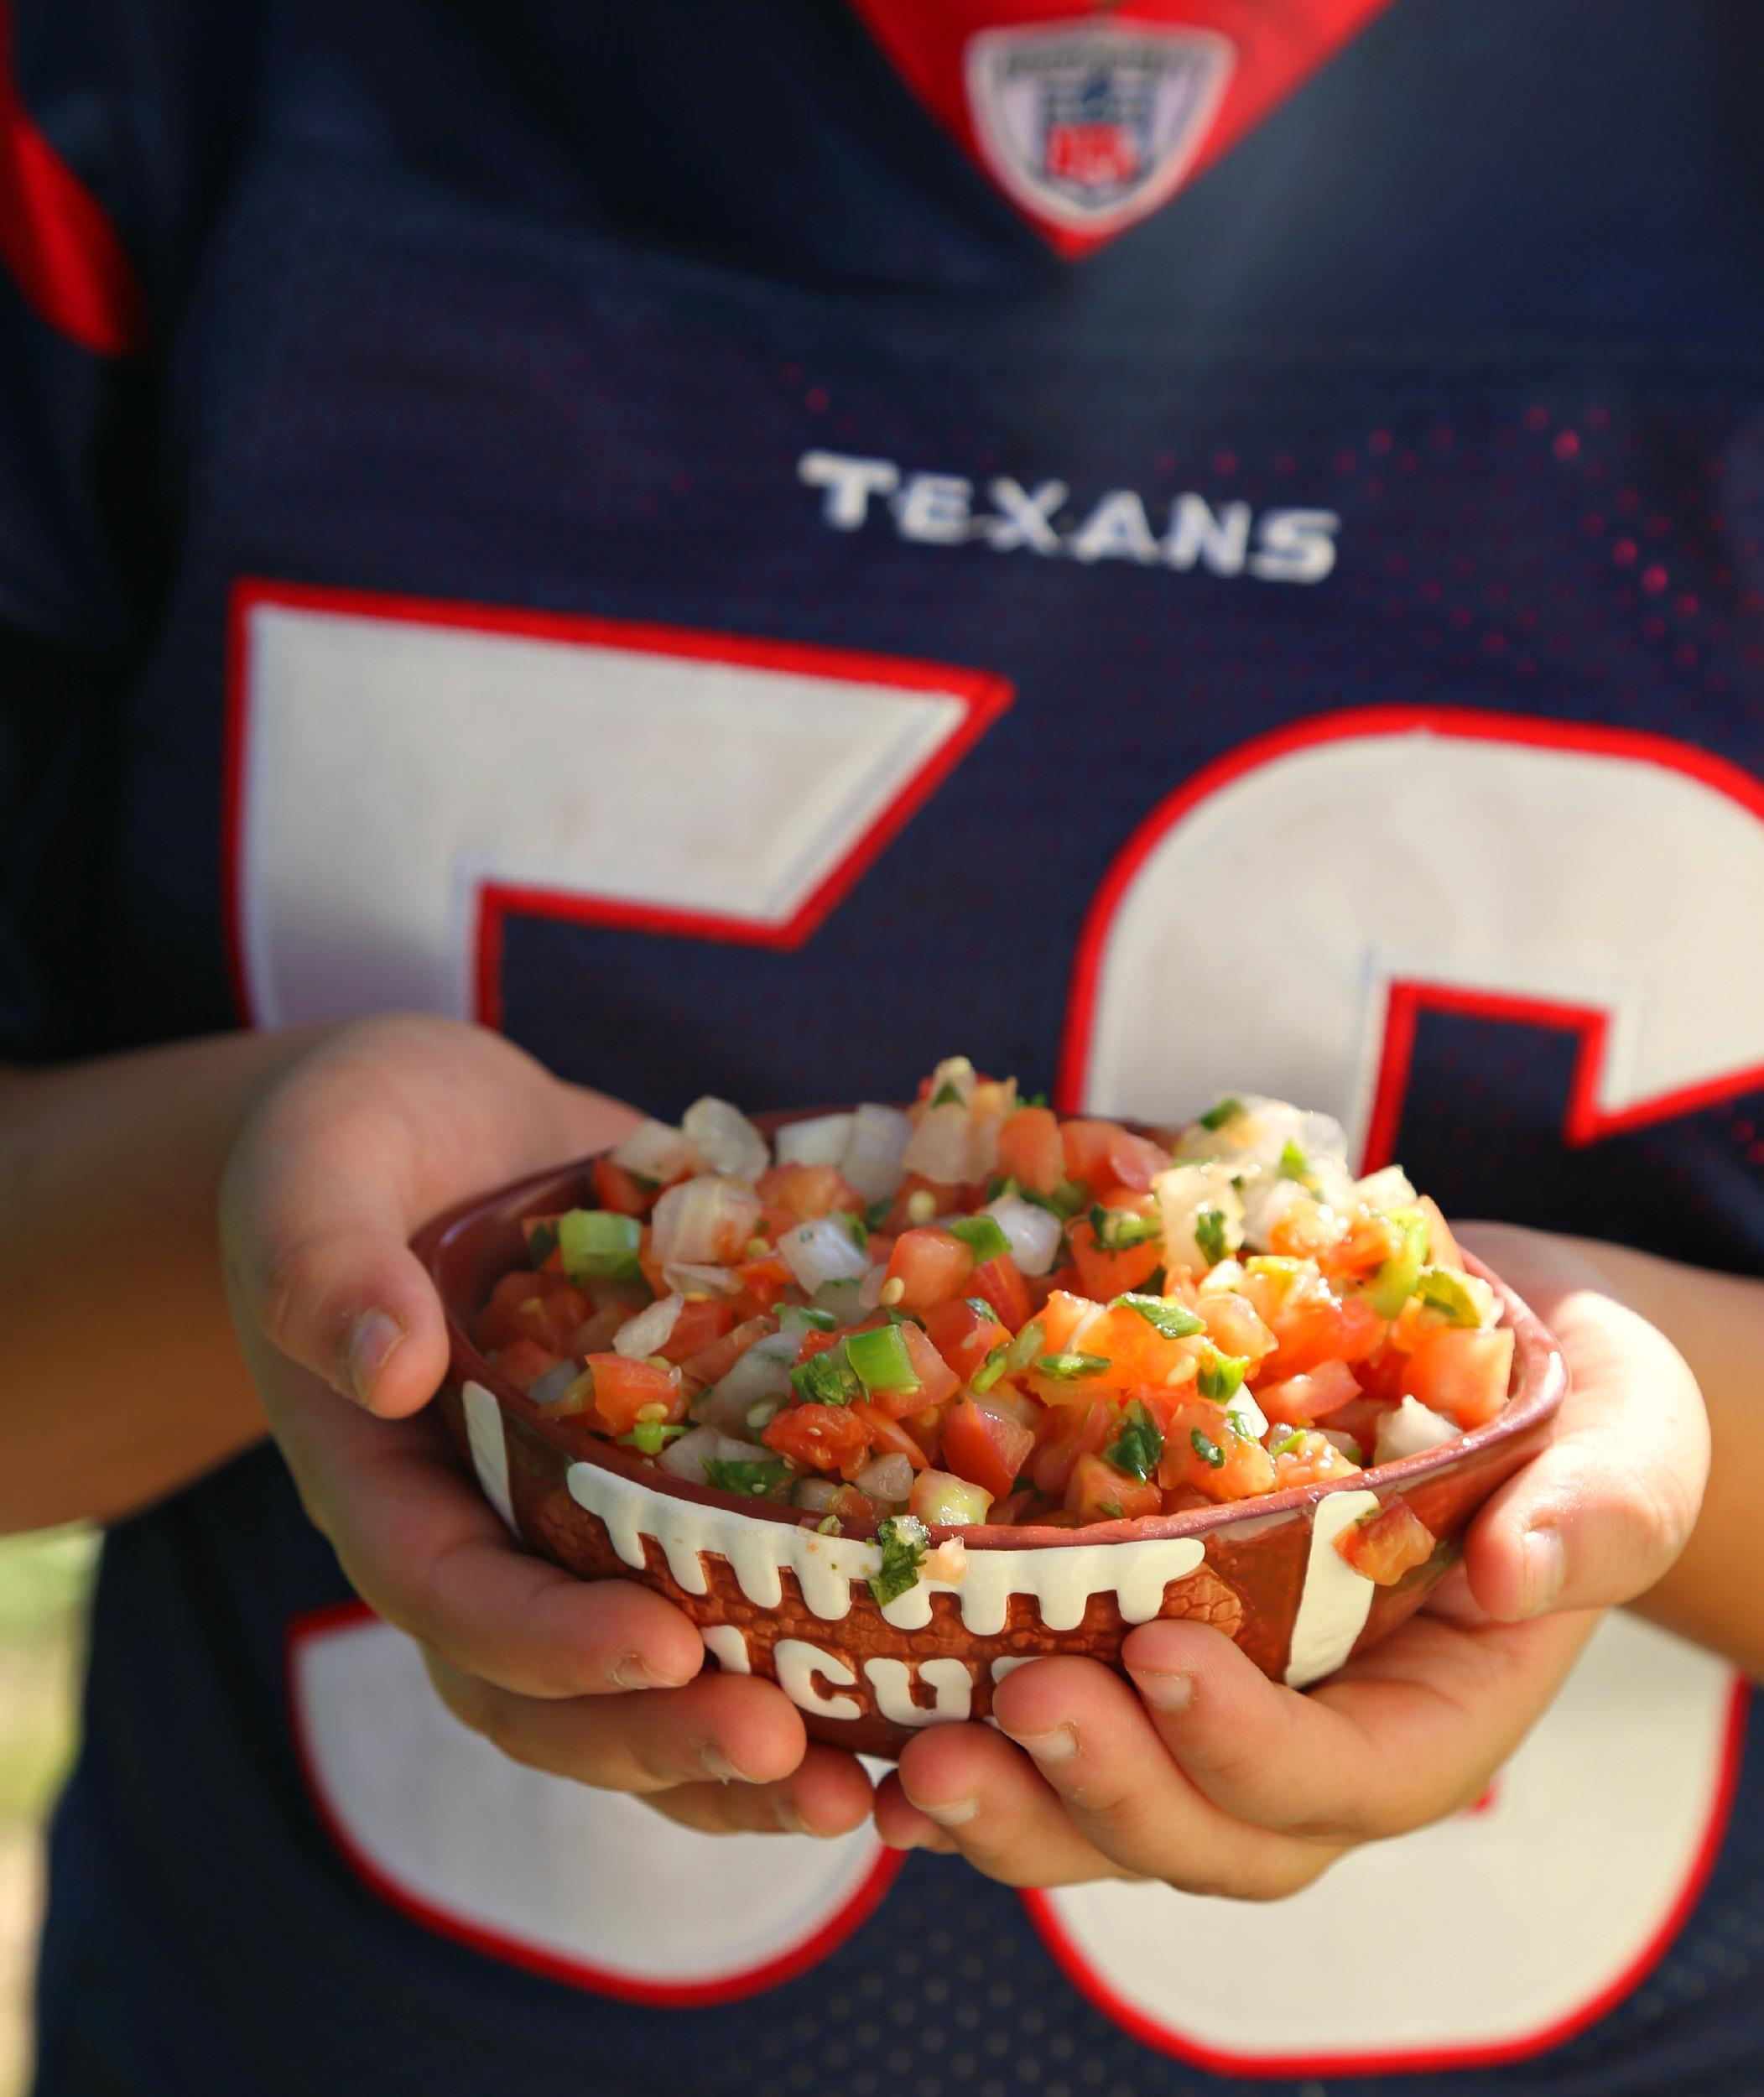 football-game-appetizers-salsa-queso-vianneyrodriguez-sweetlifebake